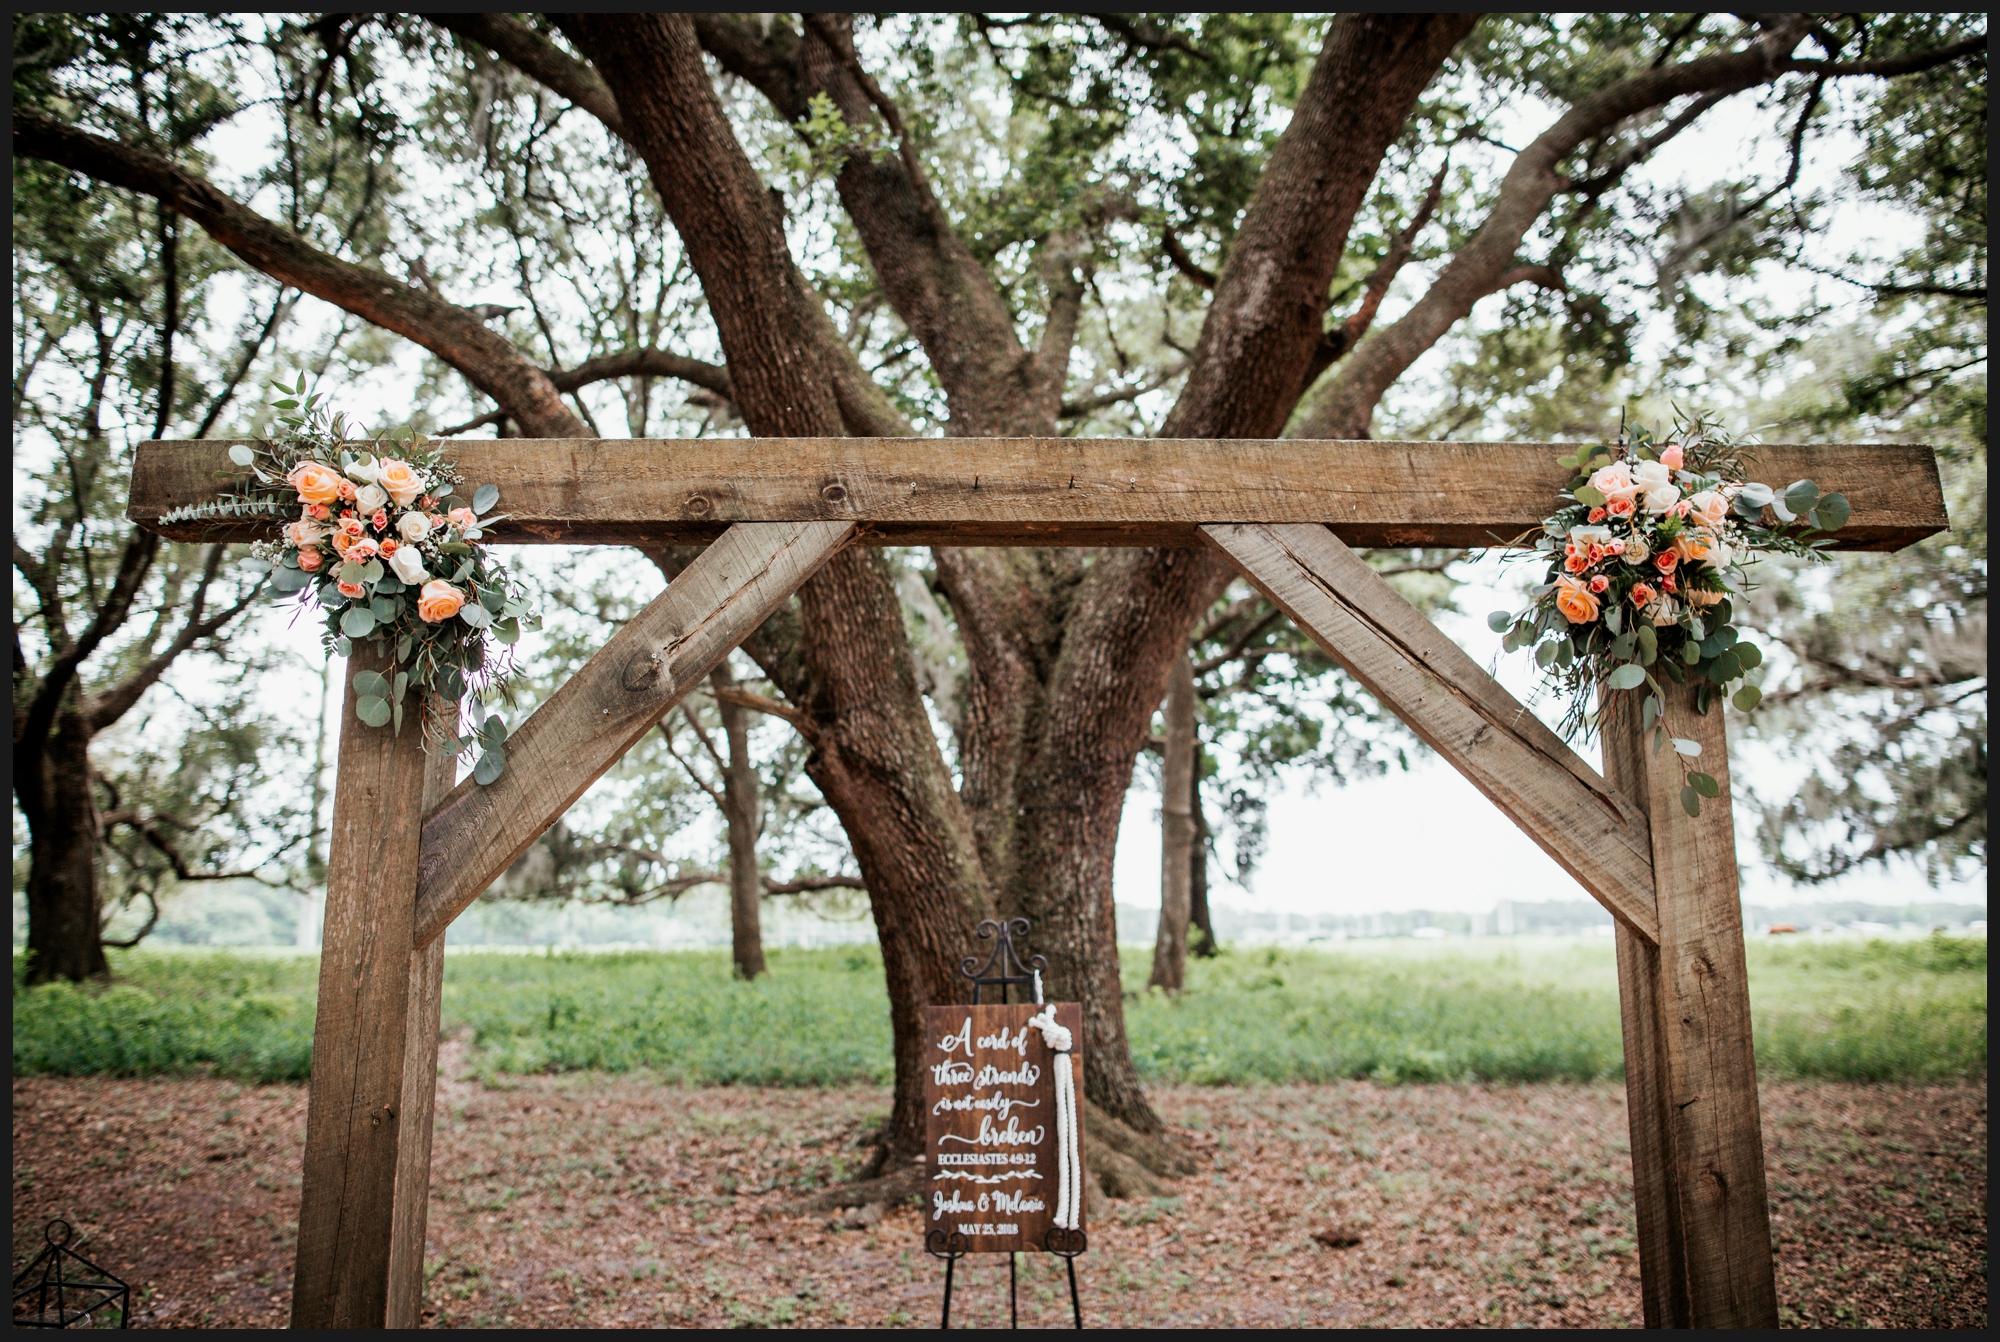 Orlando-Wedding-Photographer-destination-wedding-photographer-florida-wedding-photographer-hawaii-wedding-photographer_0304.jpg